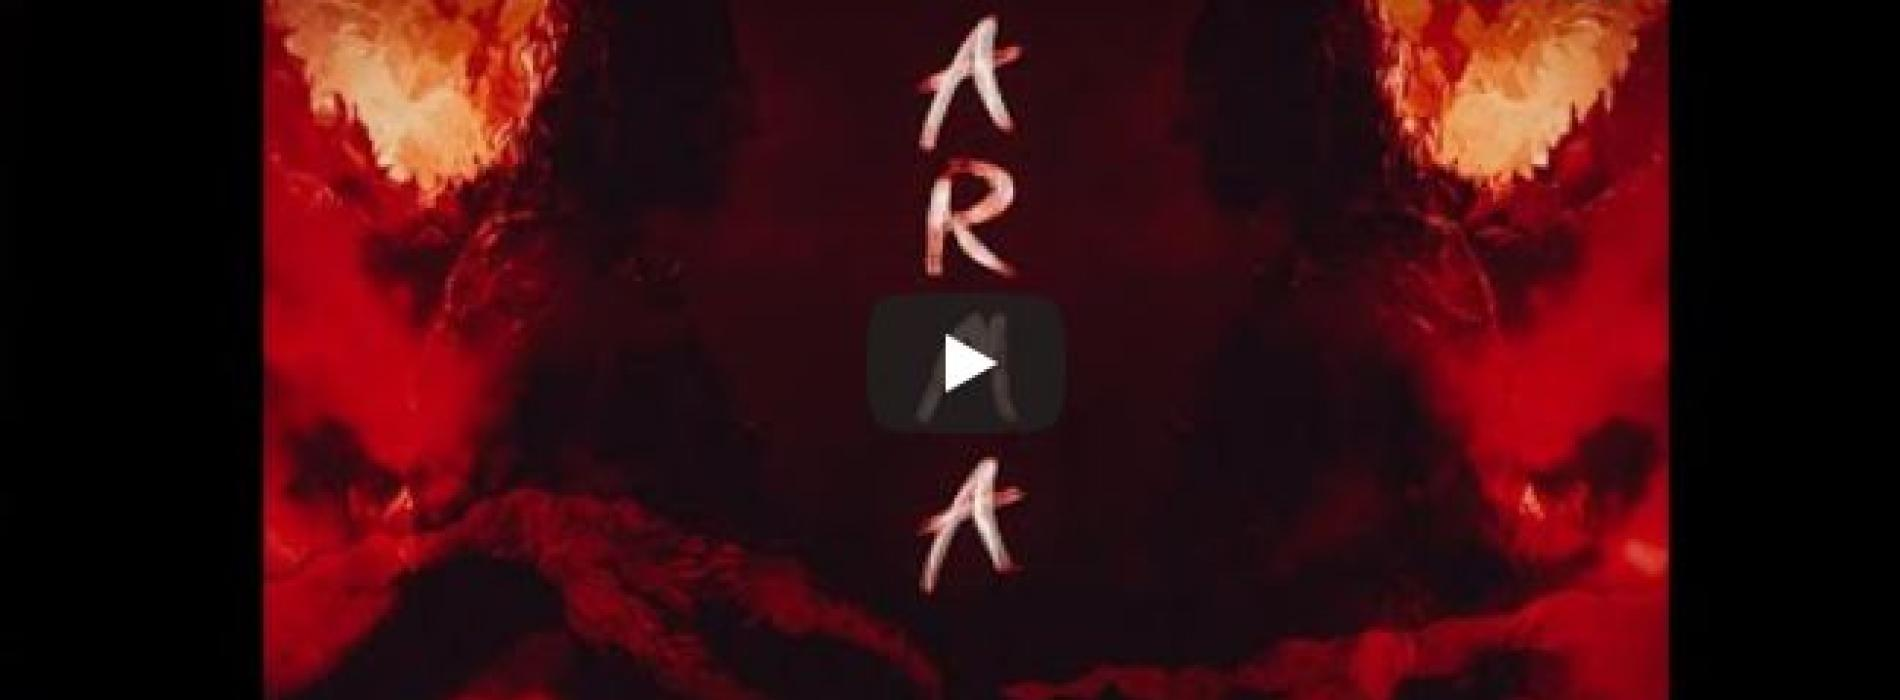 New Music : Karma – Pony Slaystation II (feat Prince Raji & Radiesha)